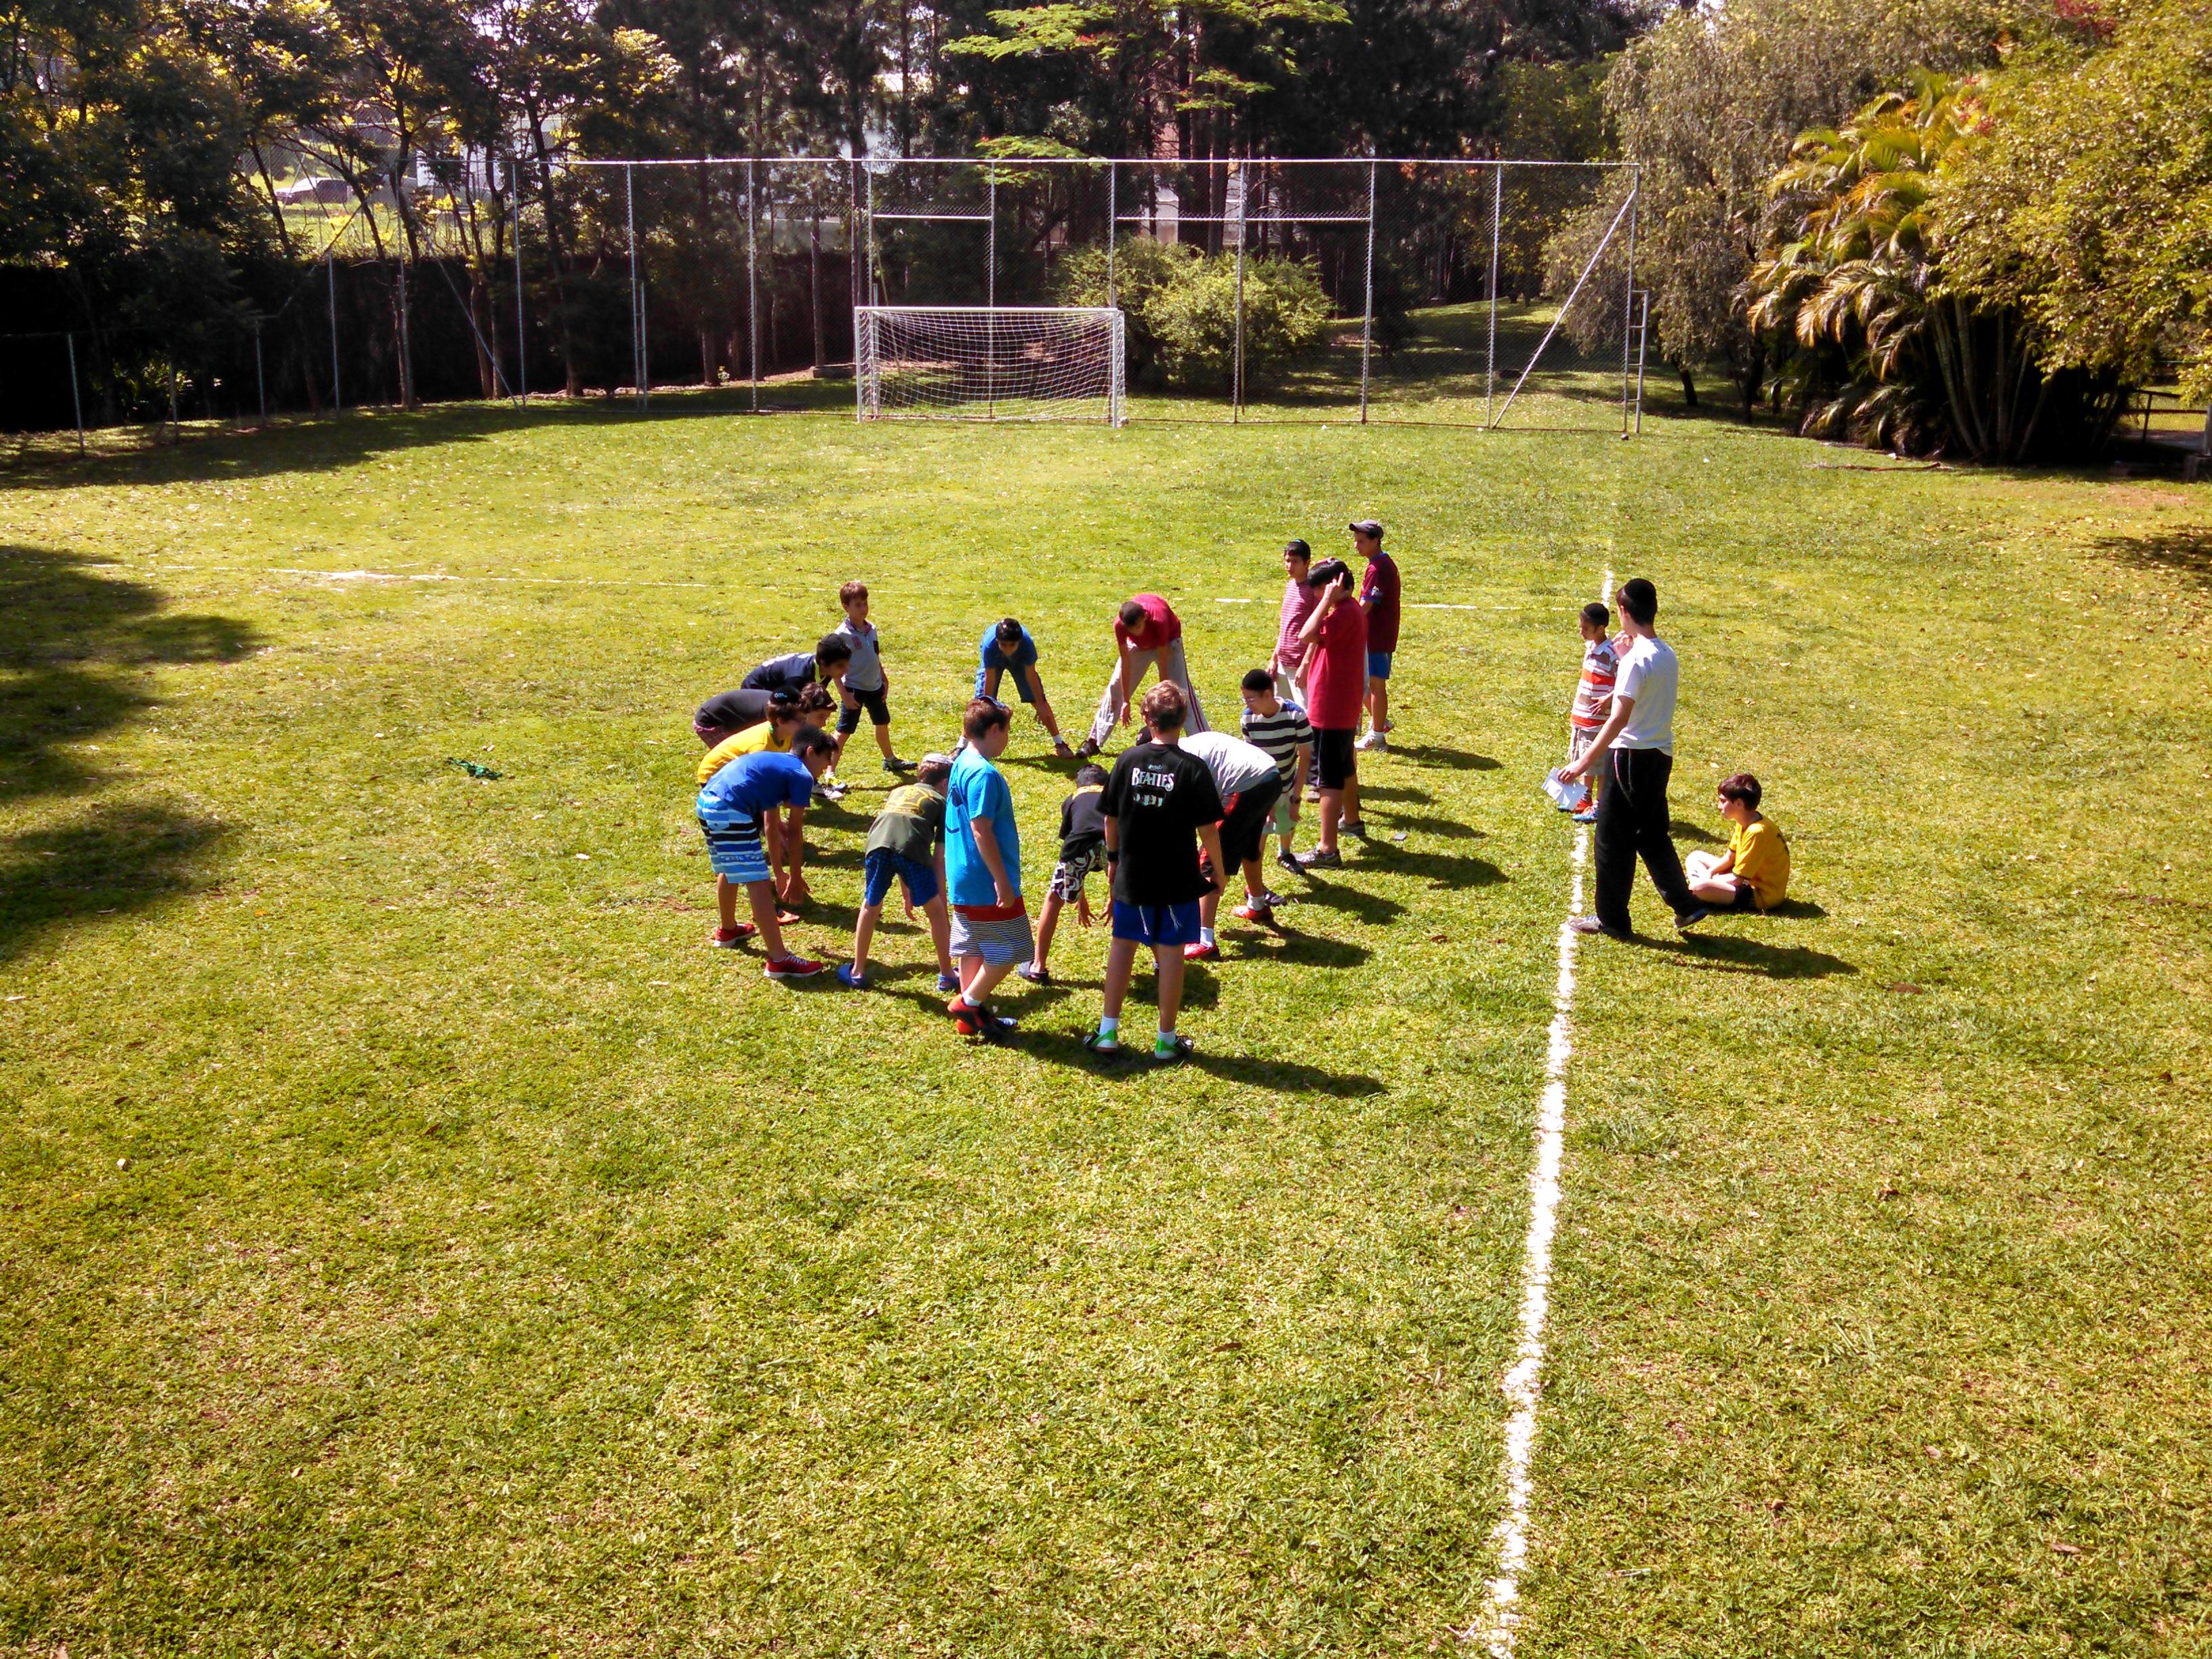 Futebol chines